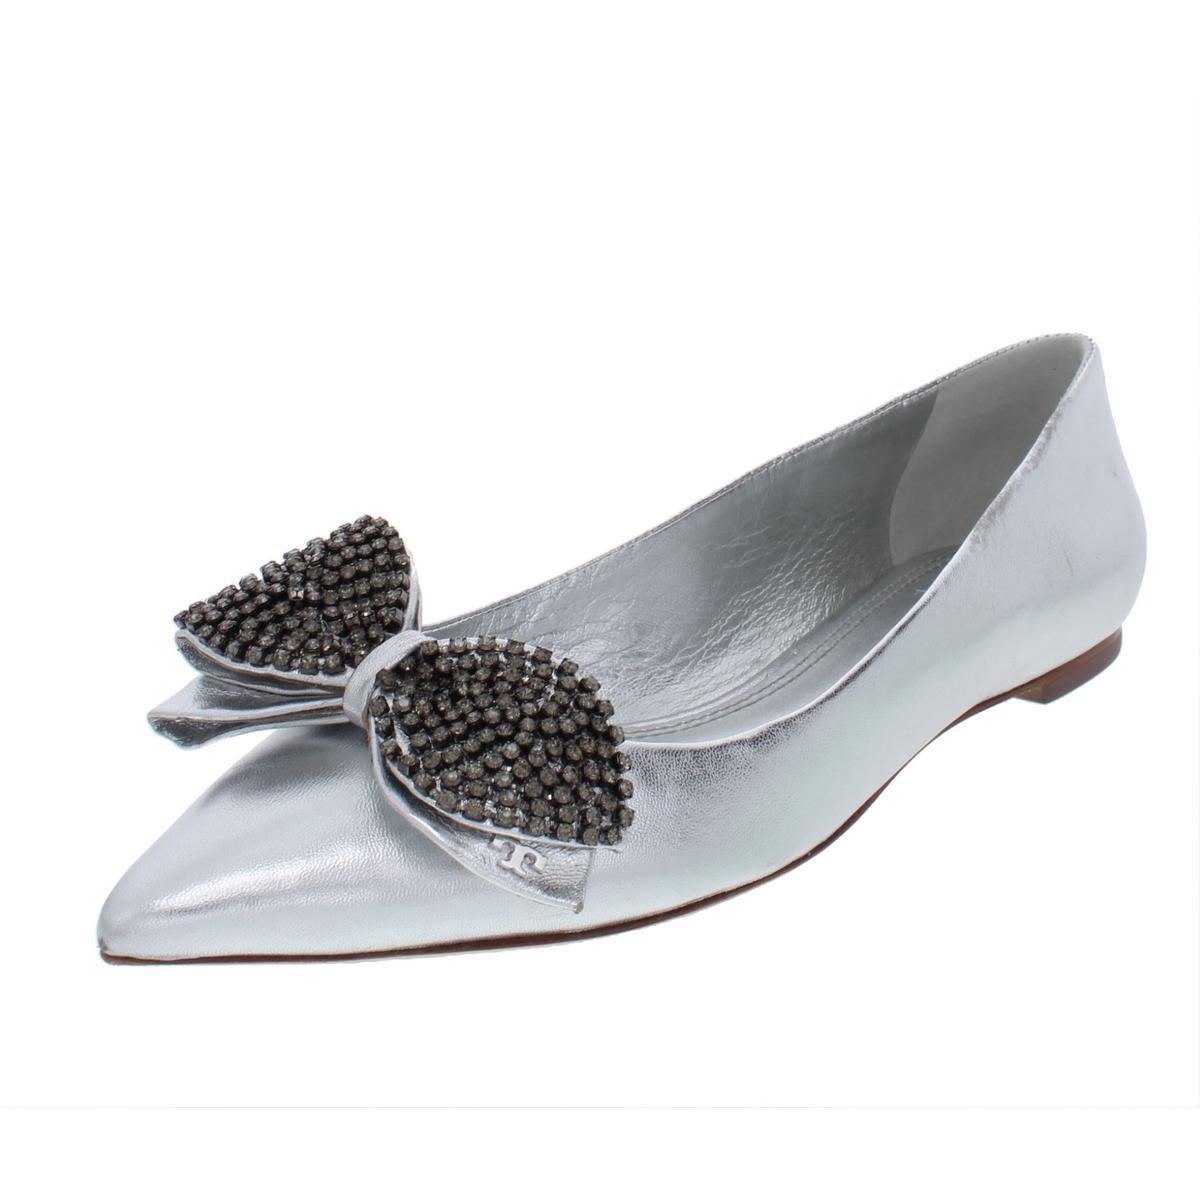 73c709106c4bbf Details about Tory Burch Womens Rosalind Silver Ballet Flats Shoes 8 Medium  (B